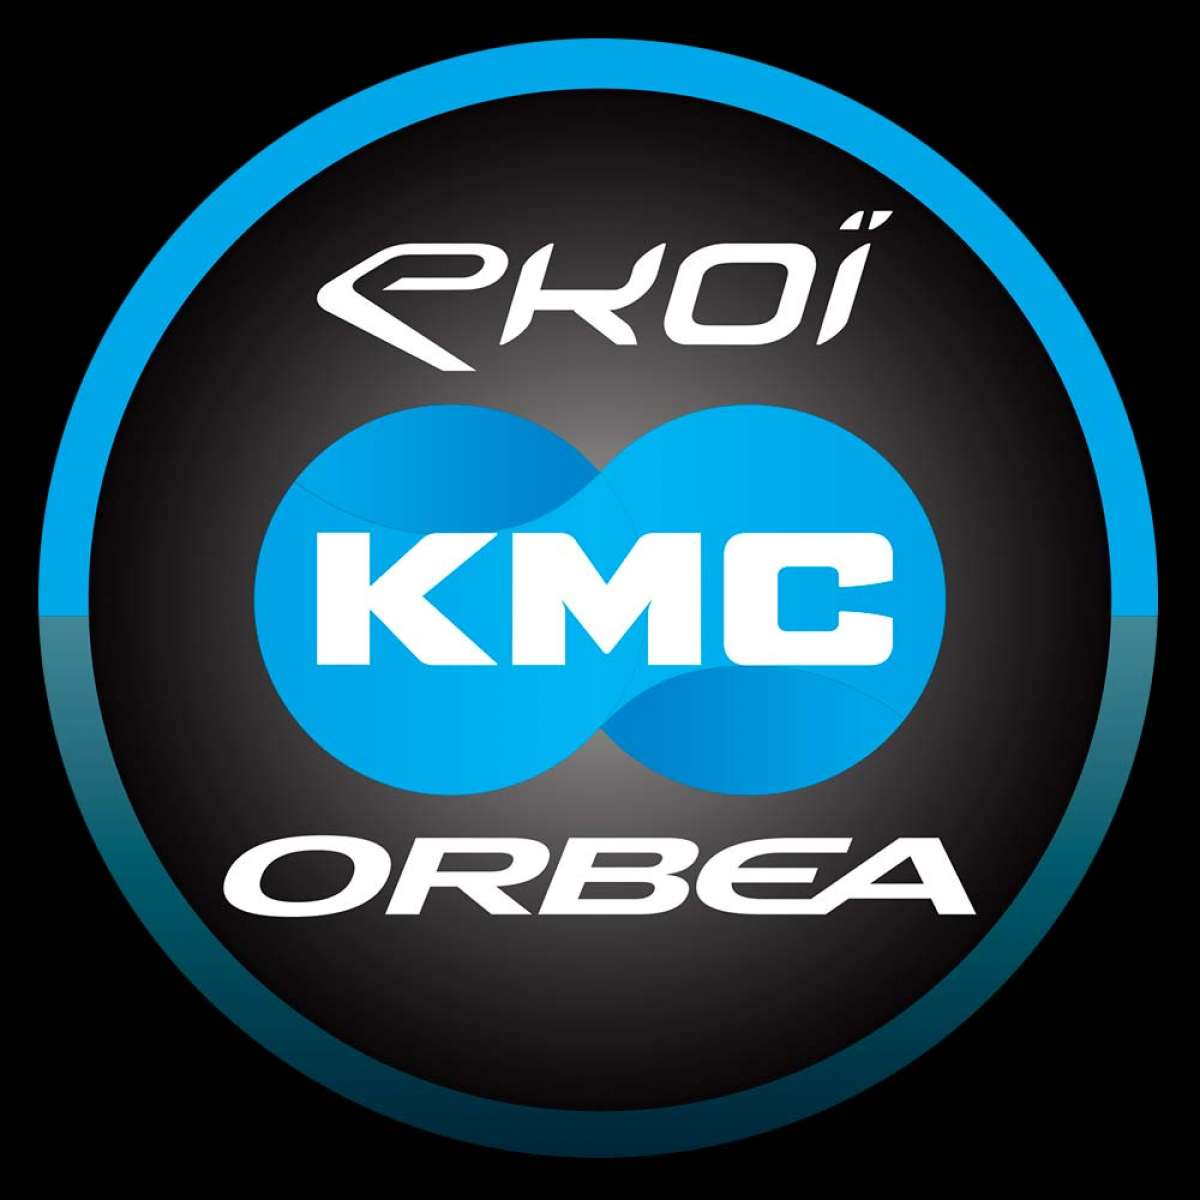 Orbea entra de pleno en la Copa del Mundo de XCO patrocinando al Team KMC-Ekoï-Orbea